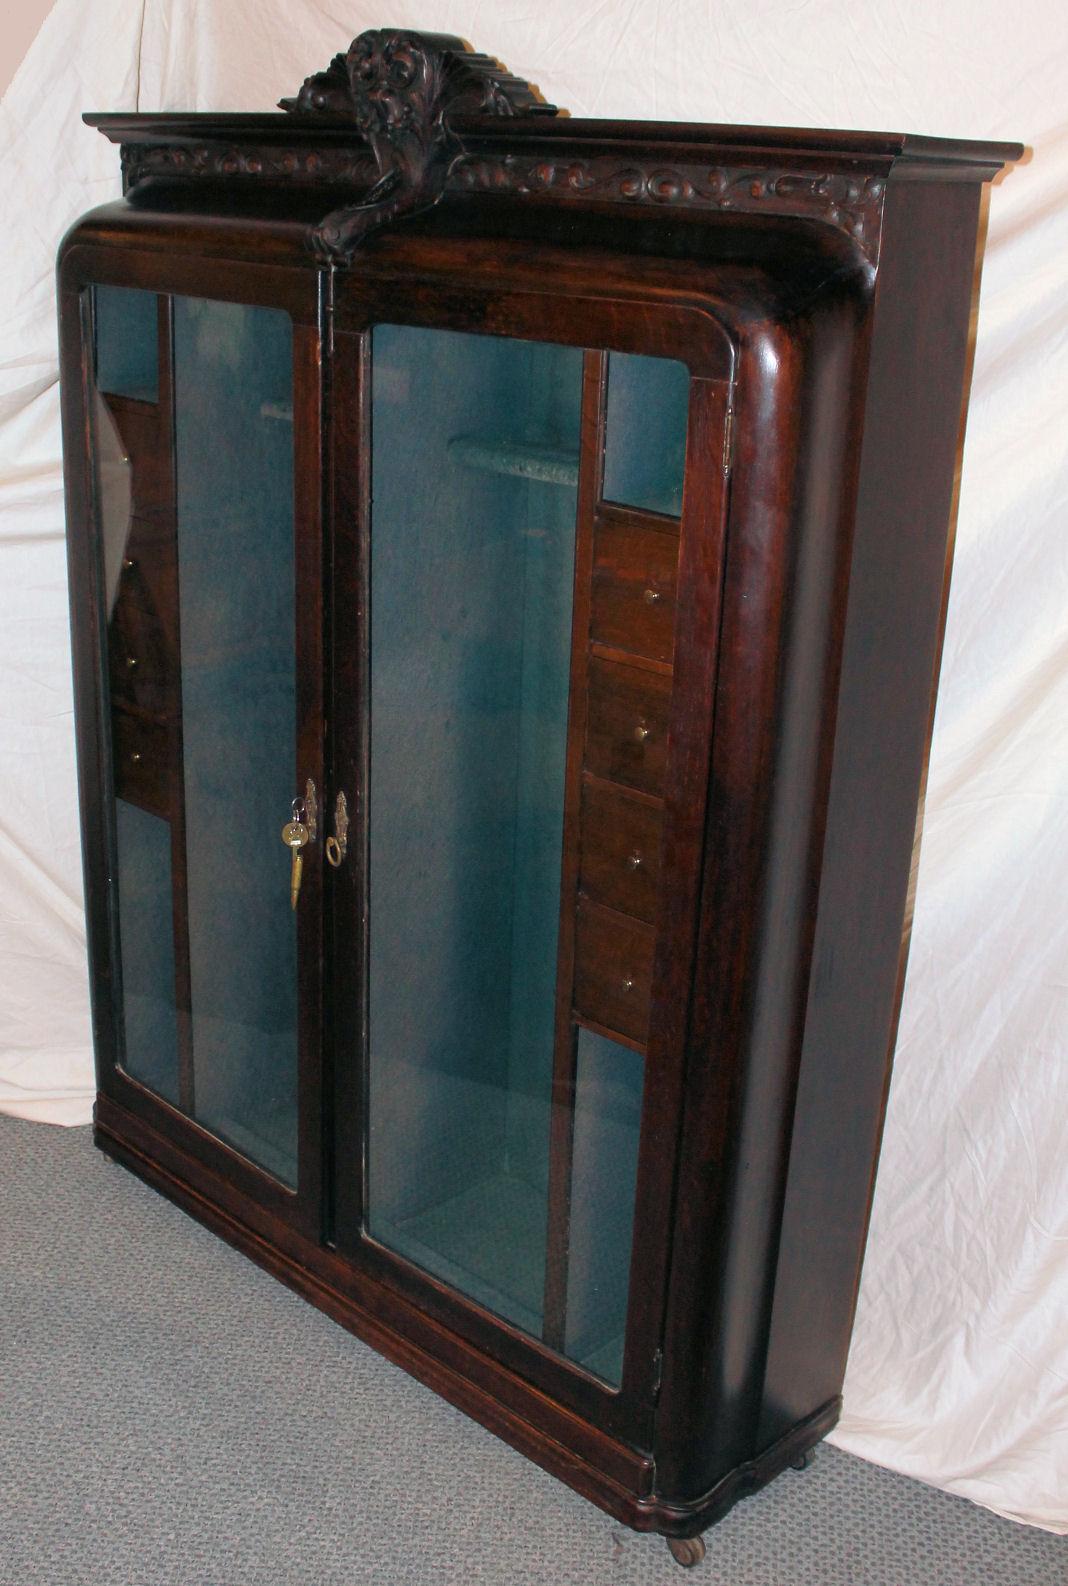 chair accessories bailey for dogs uk bargain john's antiques   rare oak antique gun cabinet -